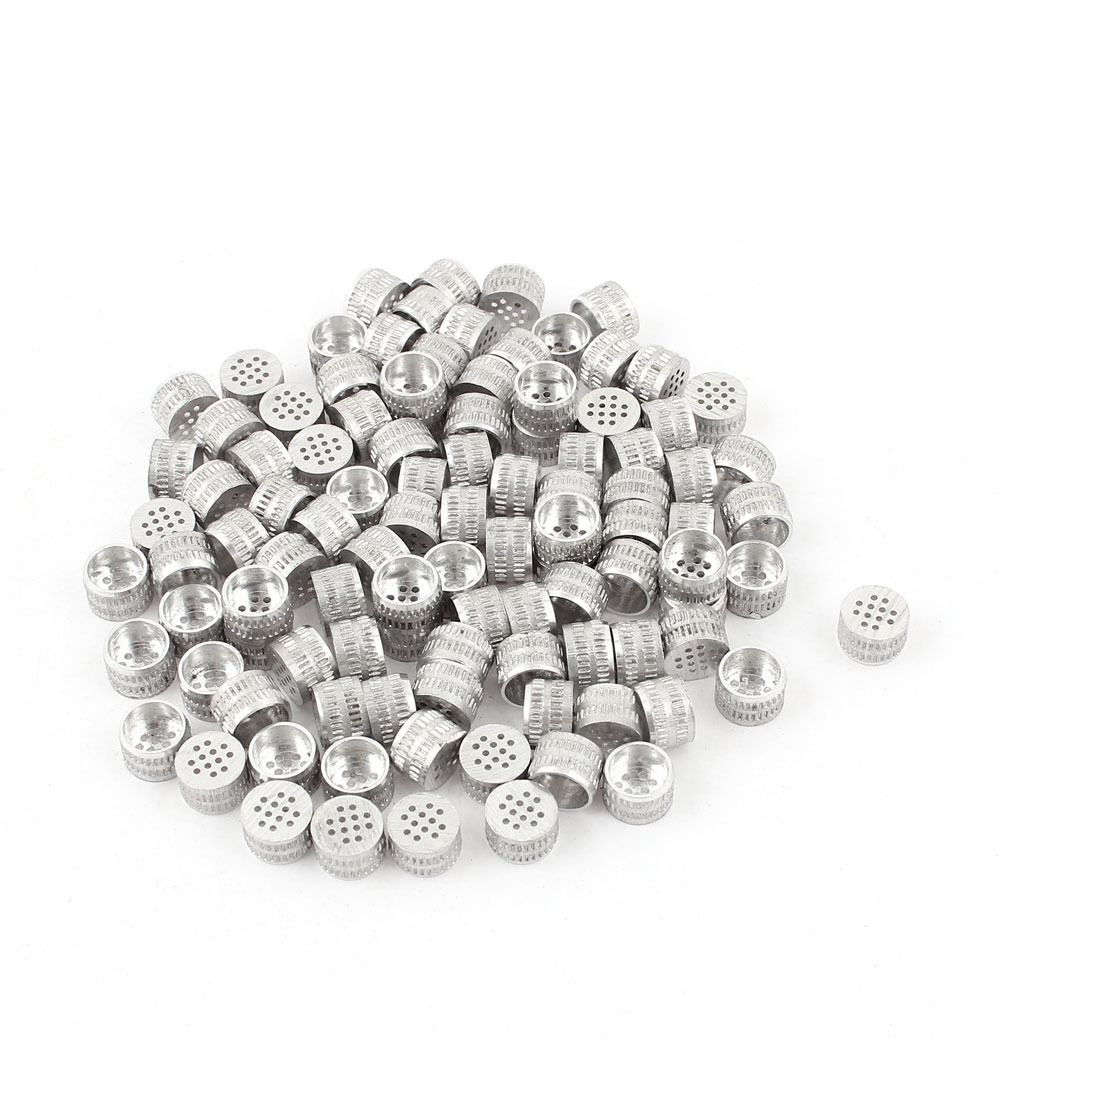 100pcs Silver Tone Aluminium Hole Type Core Box Vents 8mm x 5mm